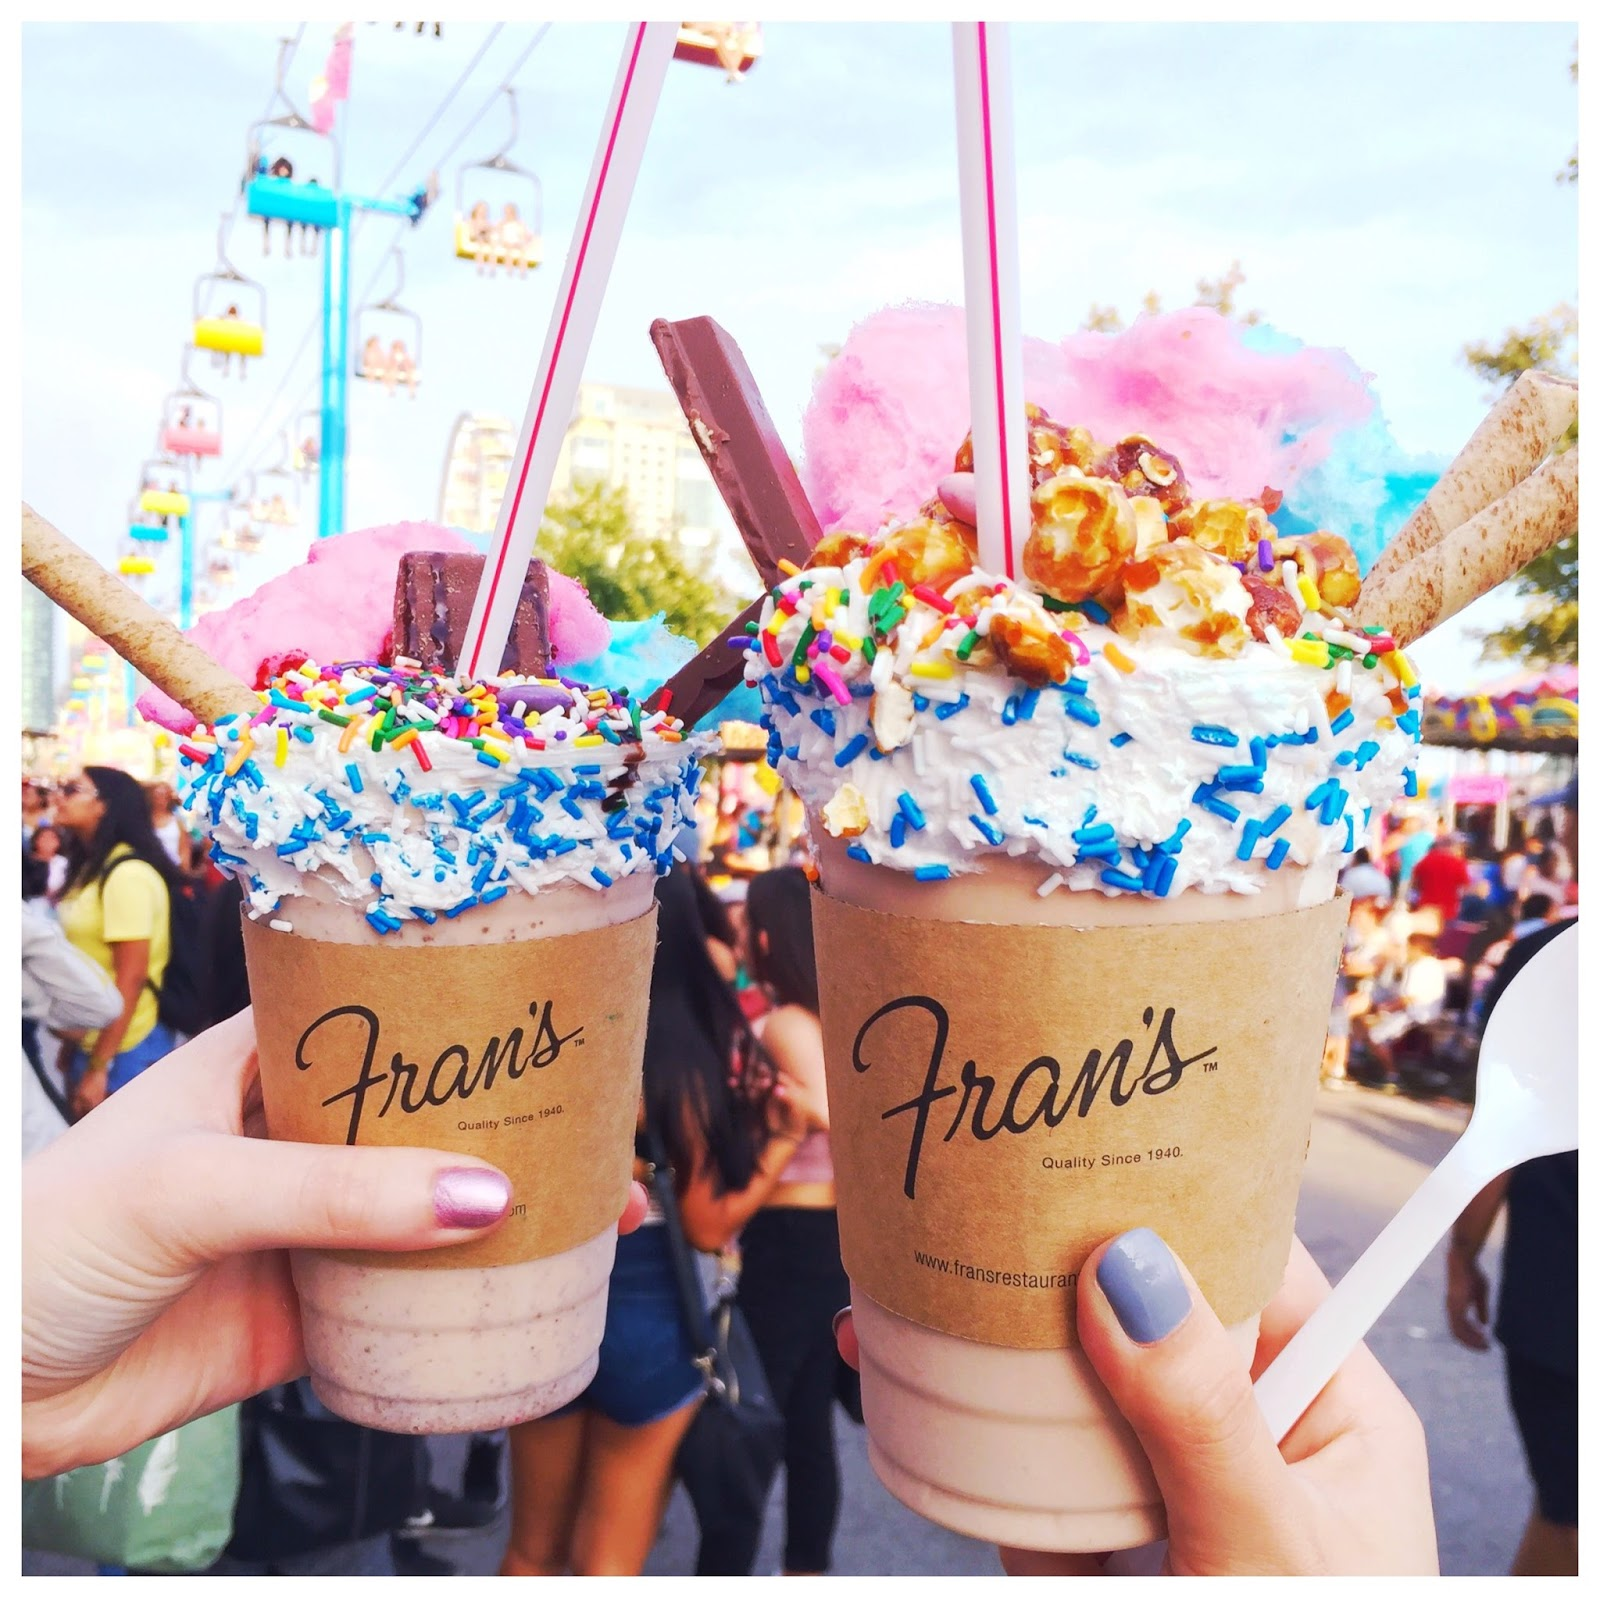 frans diner milkshakes decadent dessert toronto best places